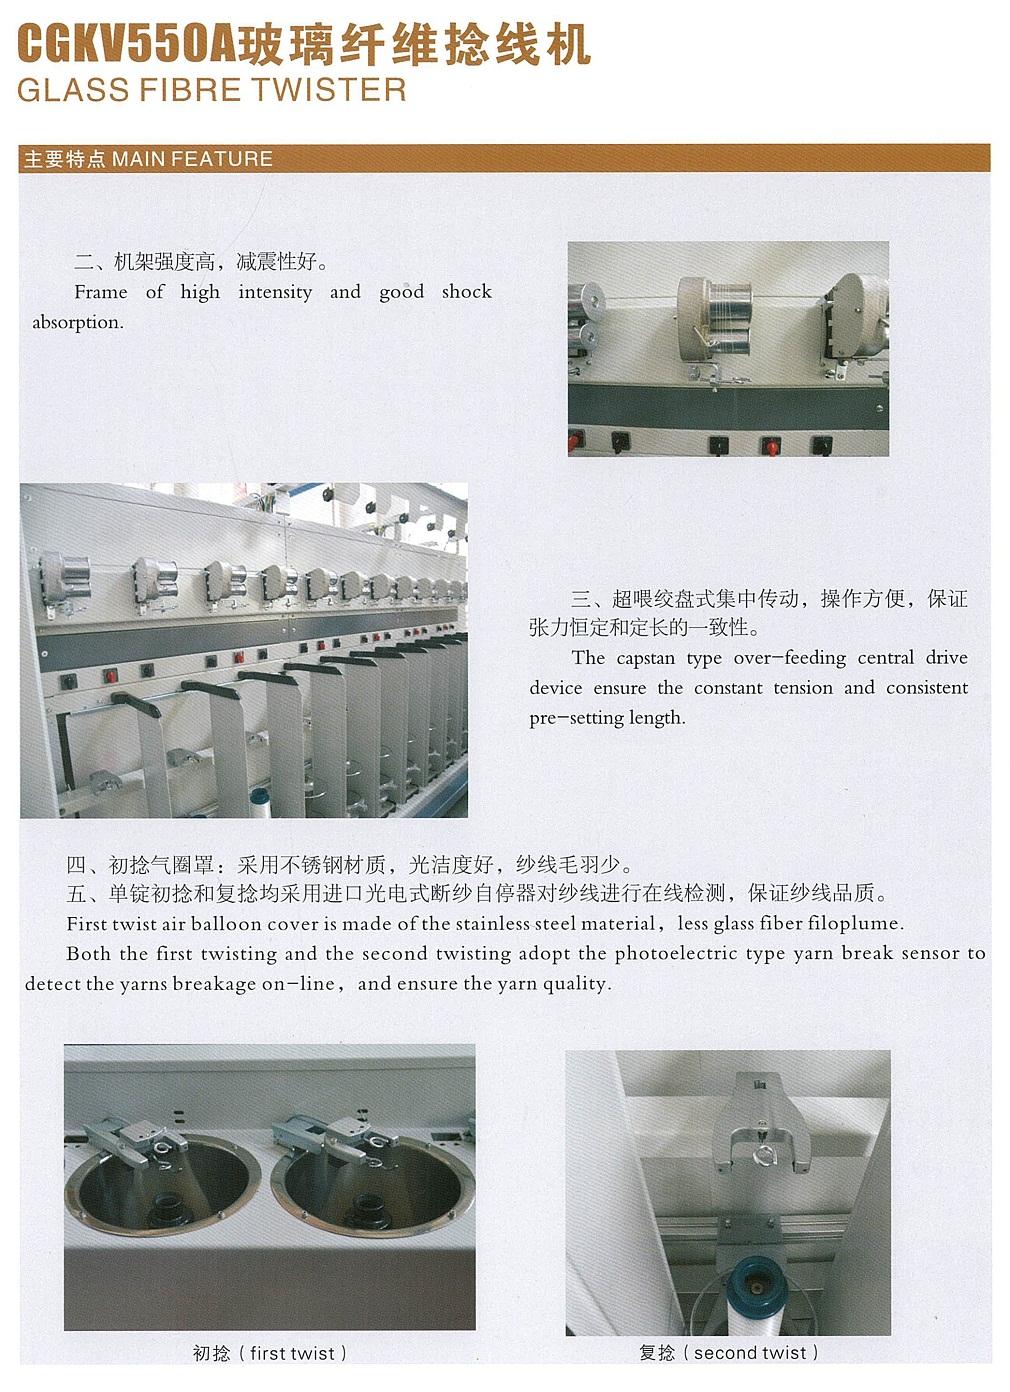 CGKV550A產品詳情二